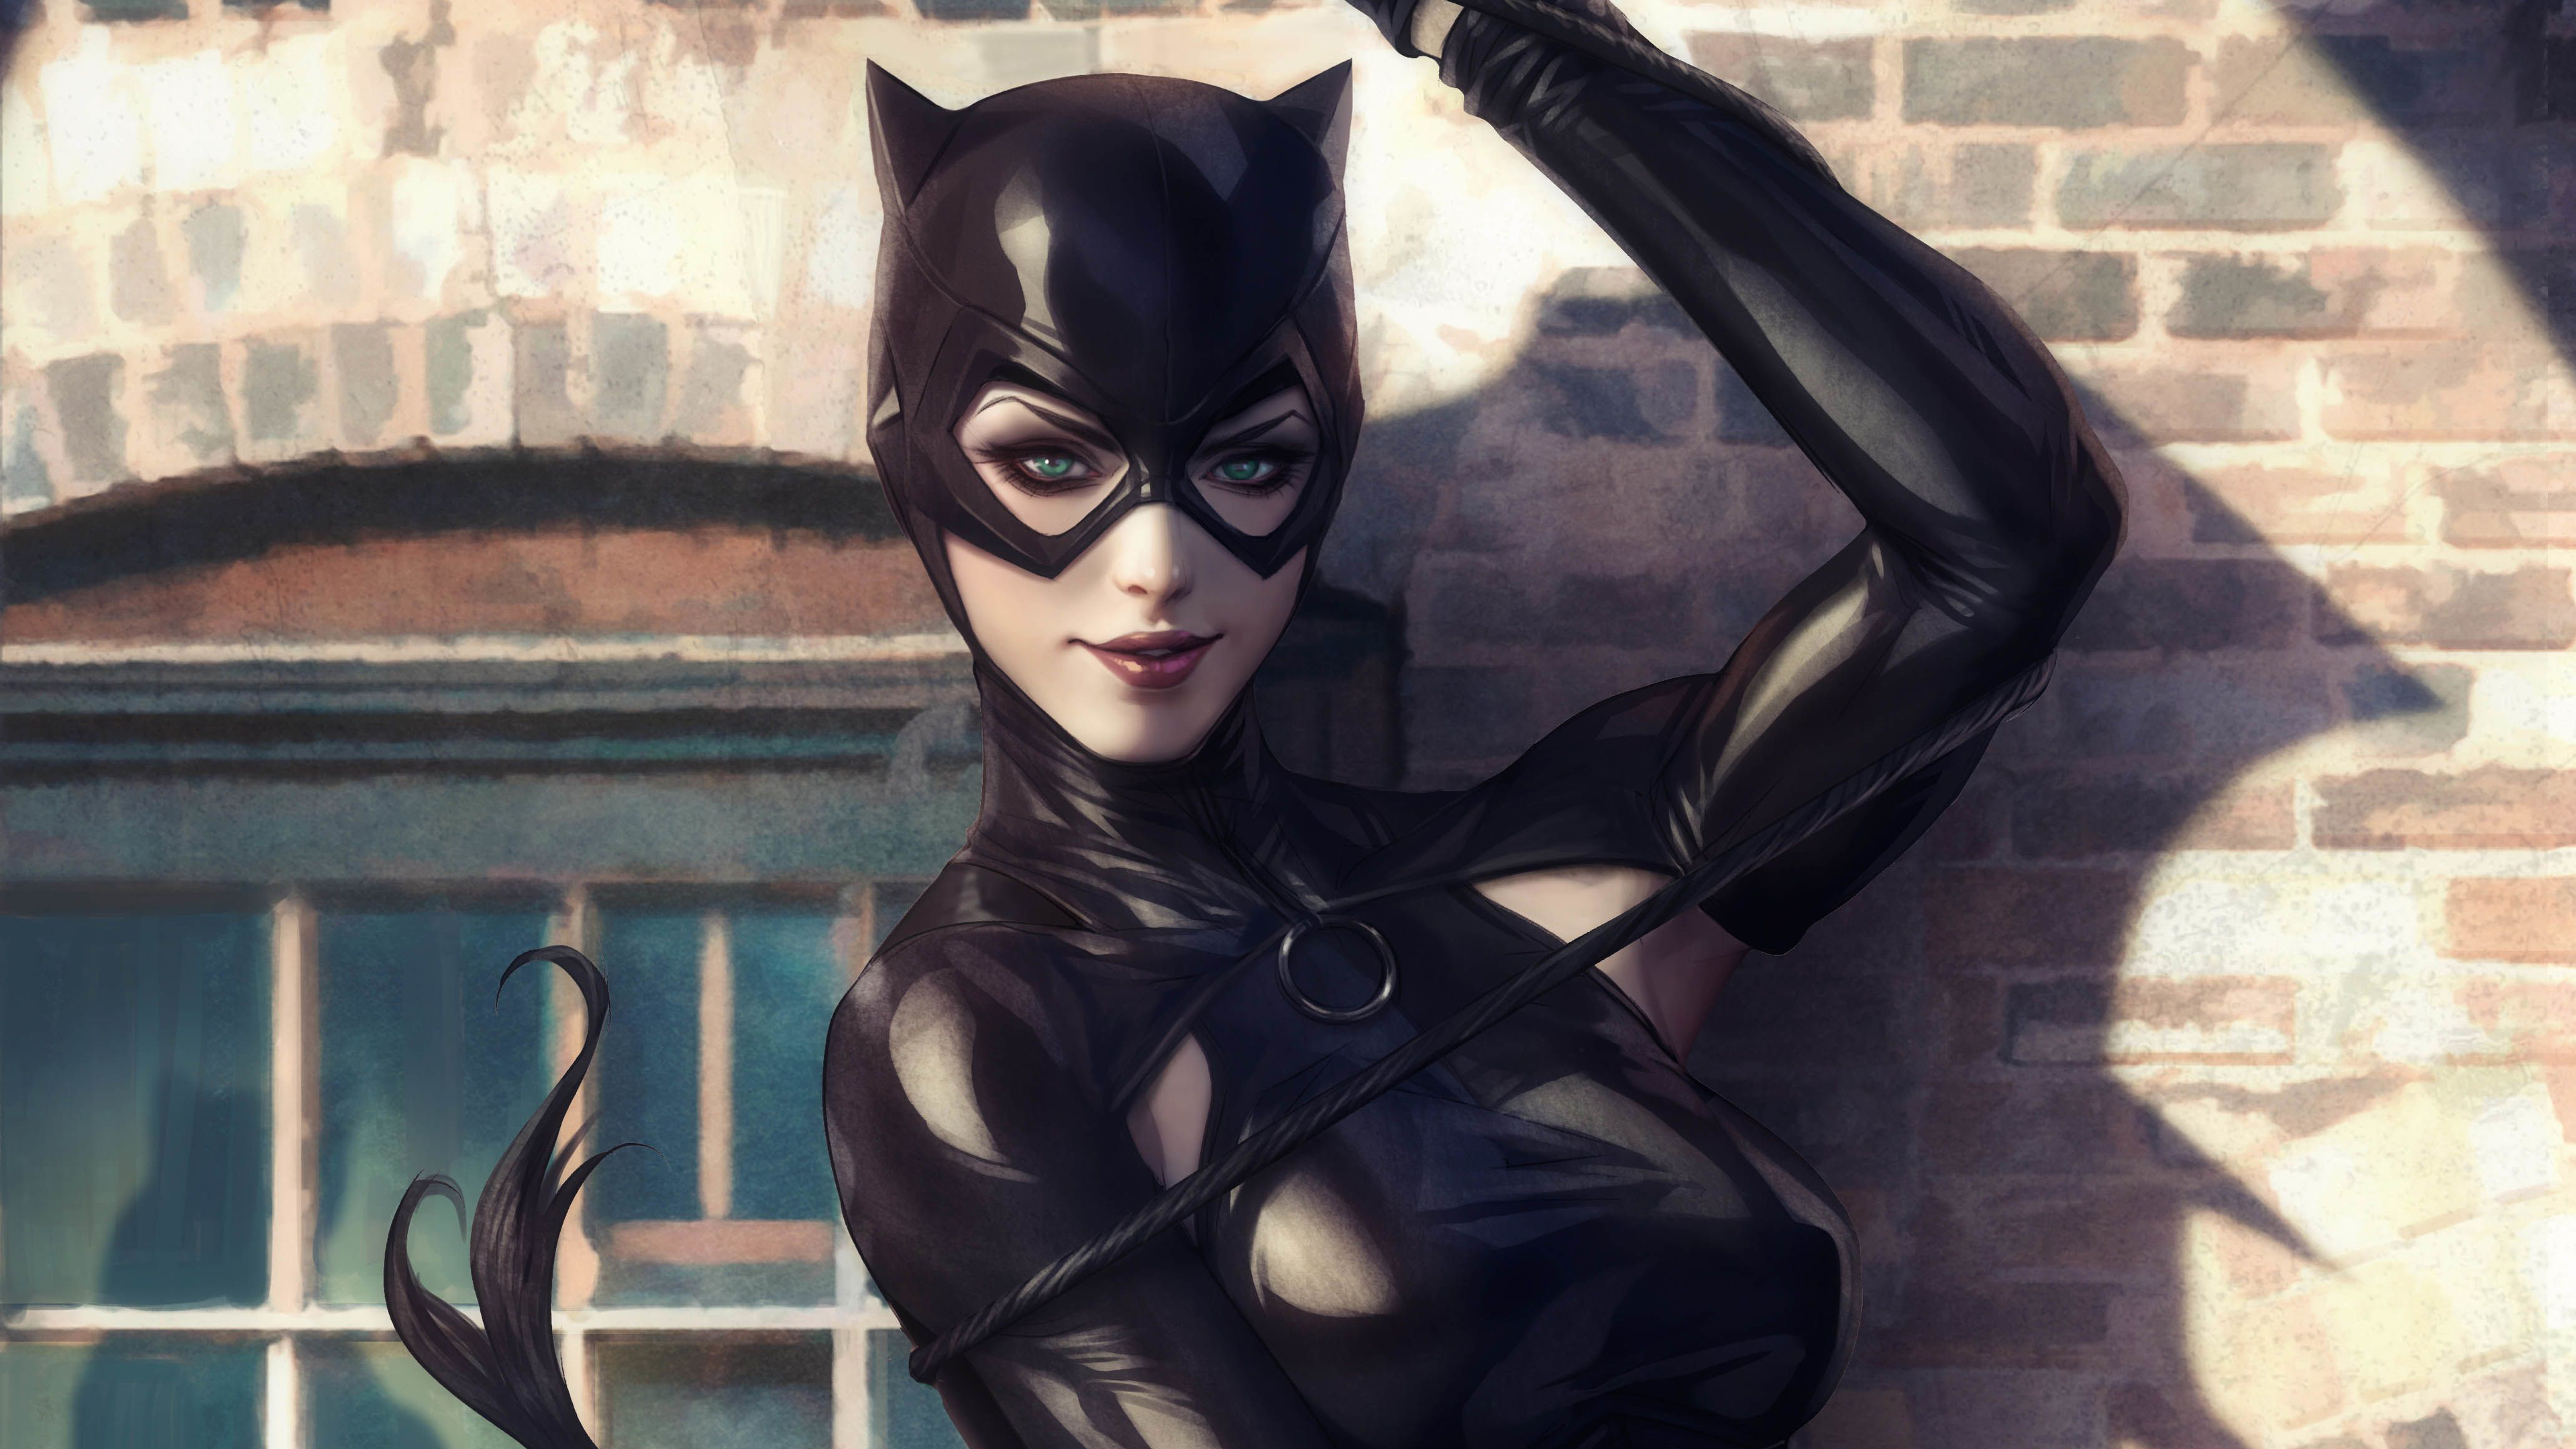 batwoman art 4k 1553072155 - Batwoman Art 4k - superheroes wallpapers, hd-wallpapers, digital art wallpapers, batwoman wallpapers, artwork wallpapers, 4k-wallpapers